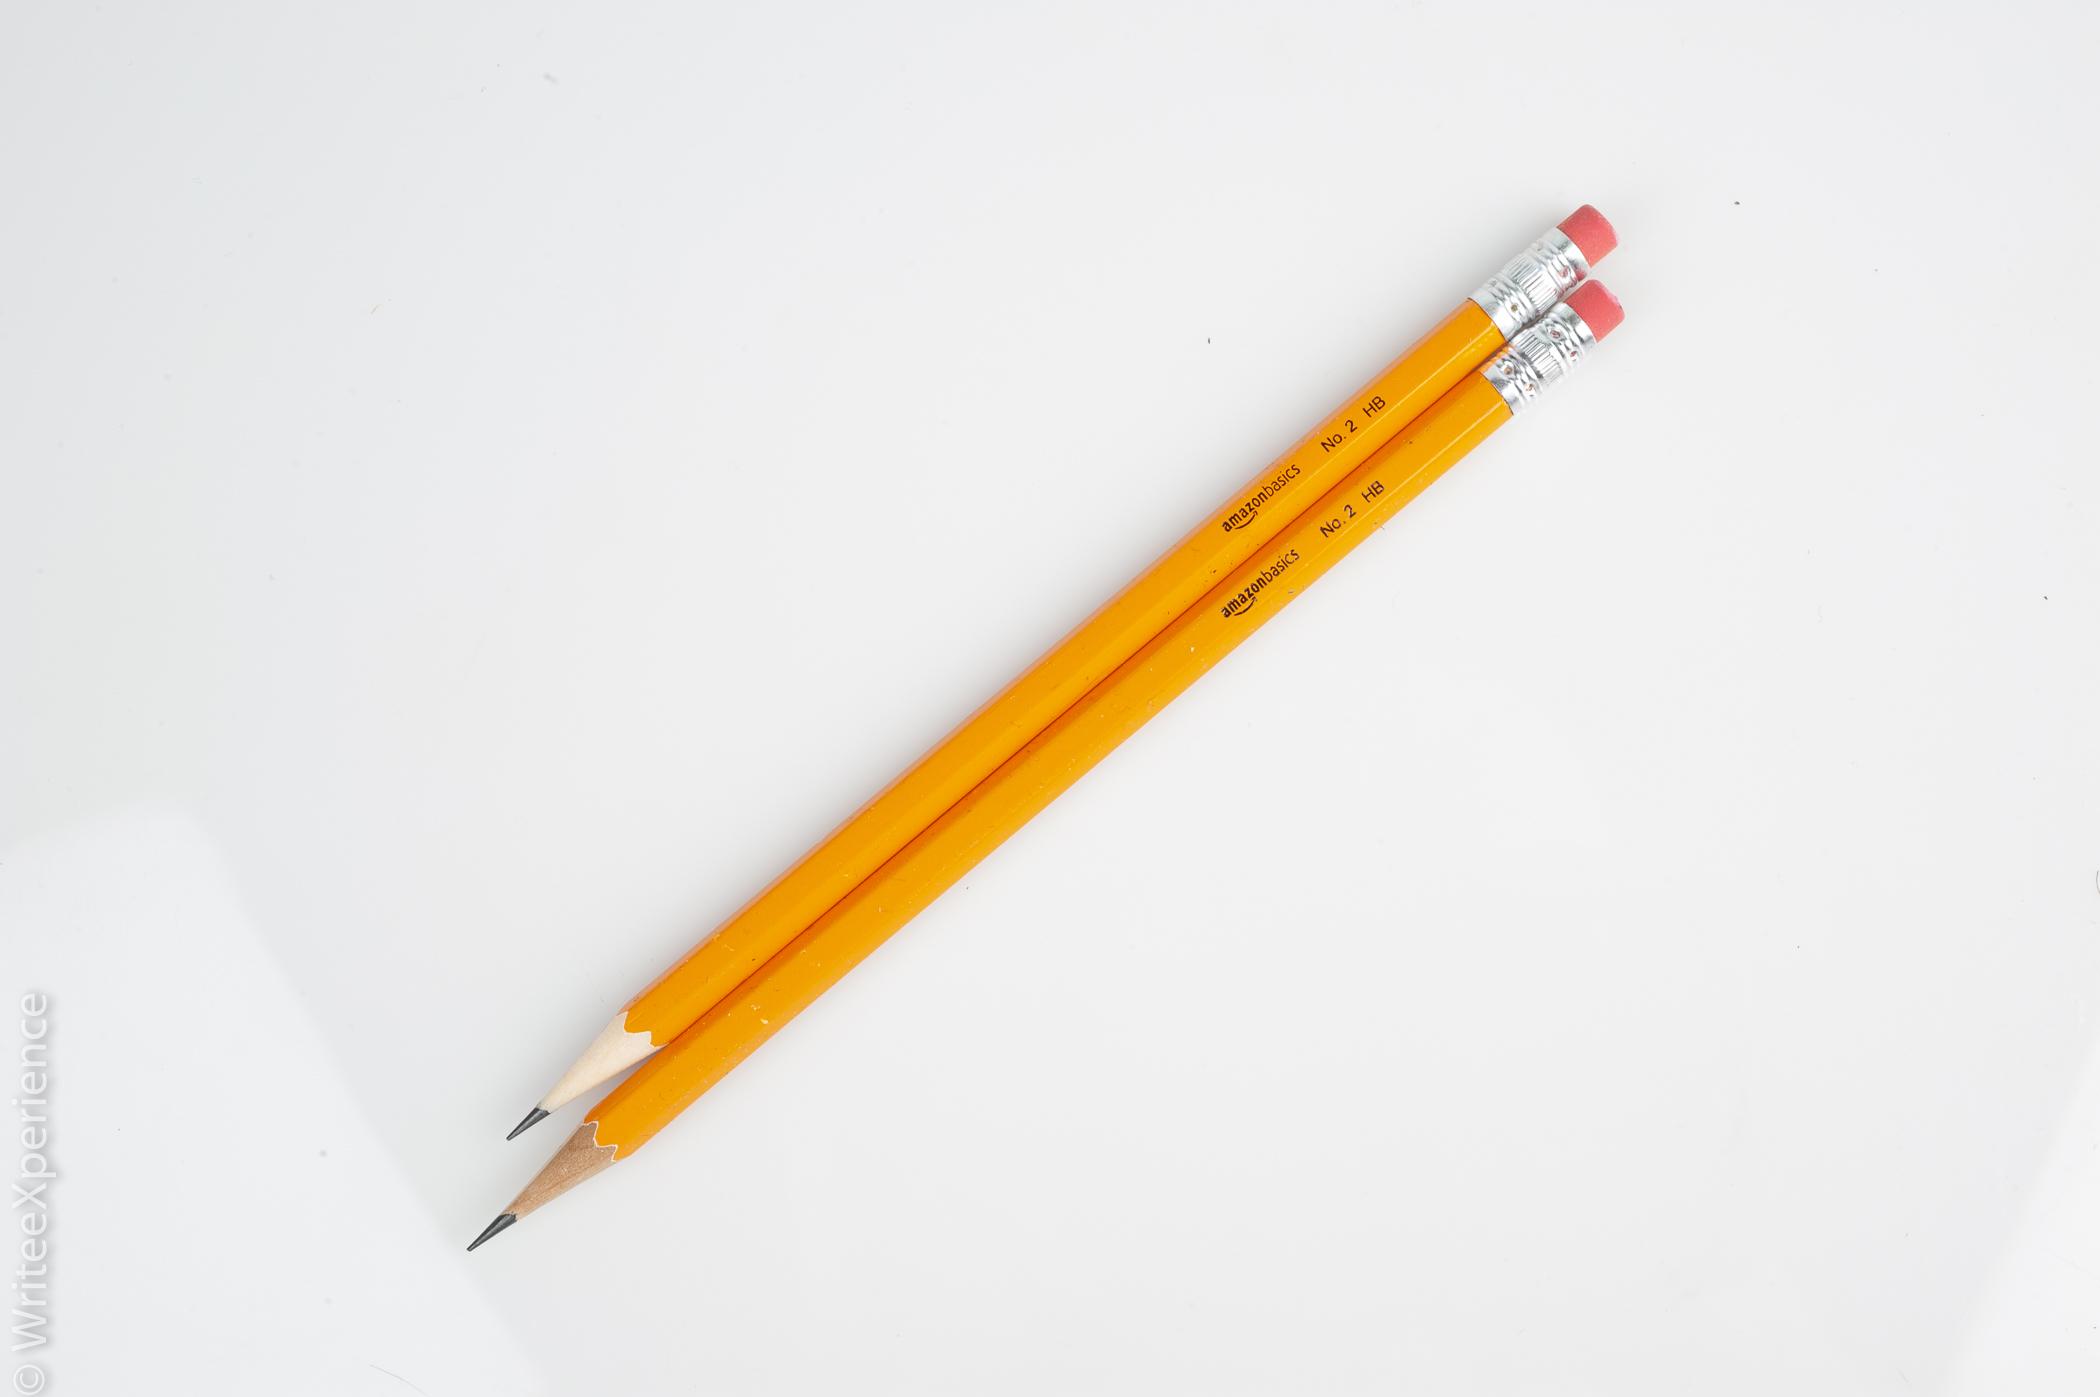 WriteeXperience-Amazon_Basic_Pencil-1.jpg